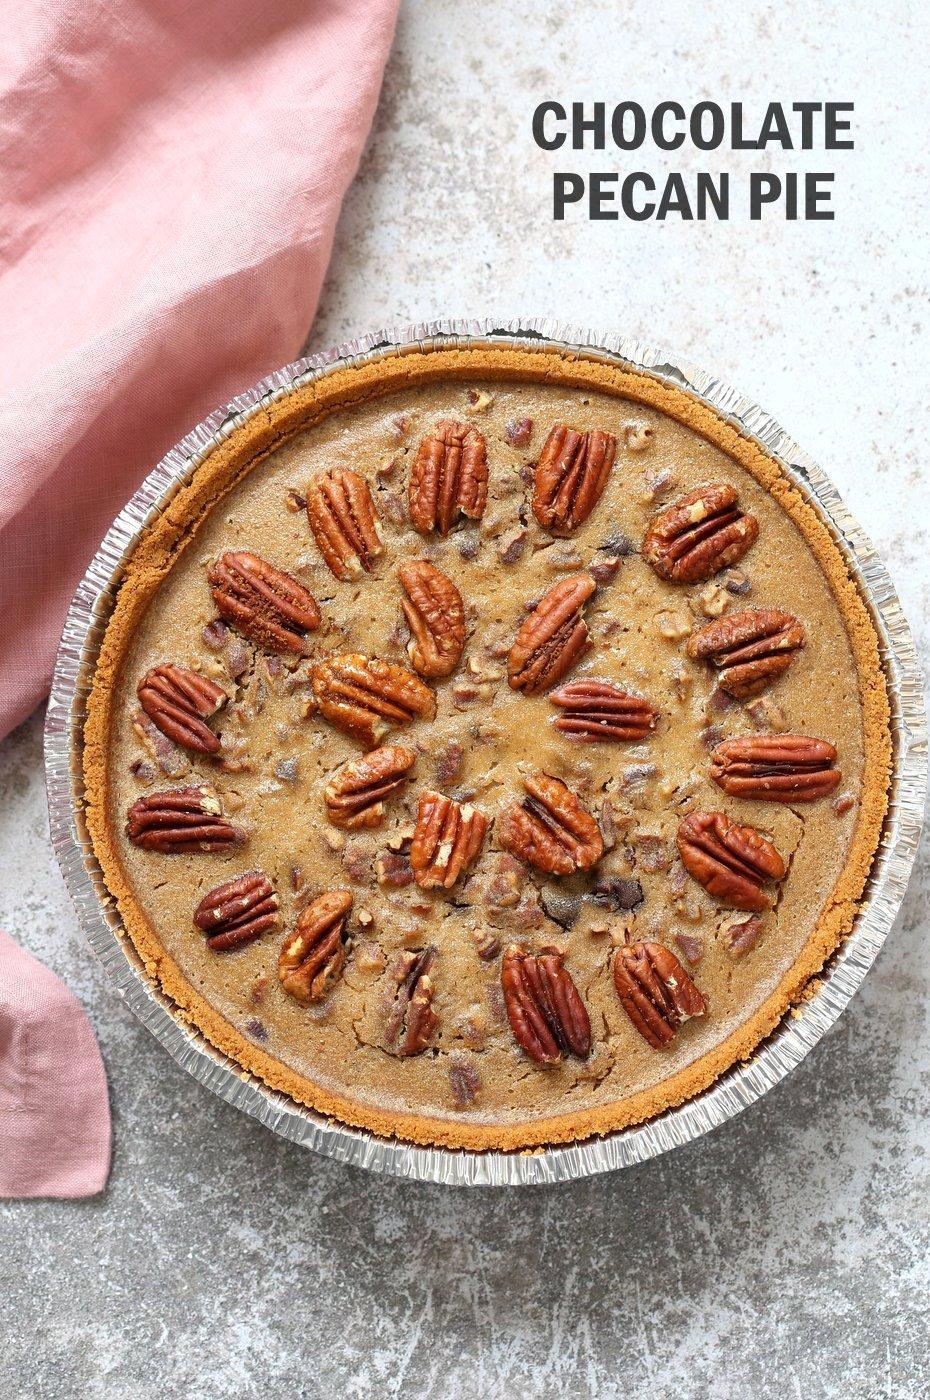 Vegan Chocolate Pecan Pie with Dates and Chai spice. All the vegan pecan pie with chocolate. Vegan Derby Pie. Glutenfree with gf crust. Soyfree Recipe.#vegan #veganricha | VeganRicha.com